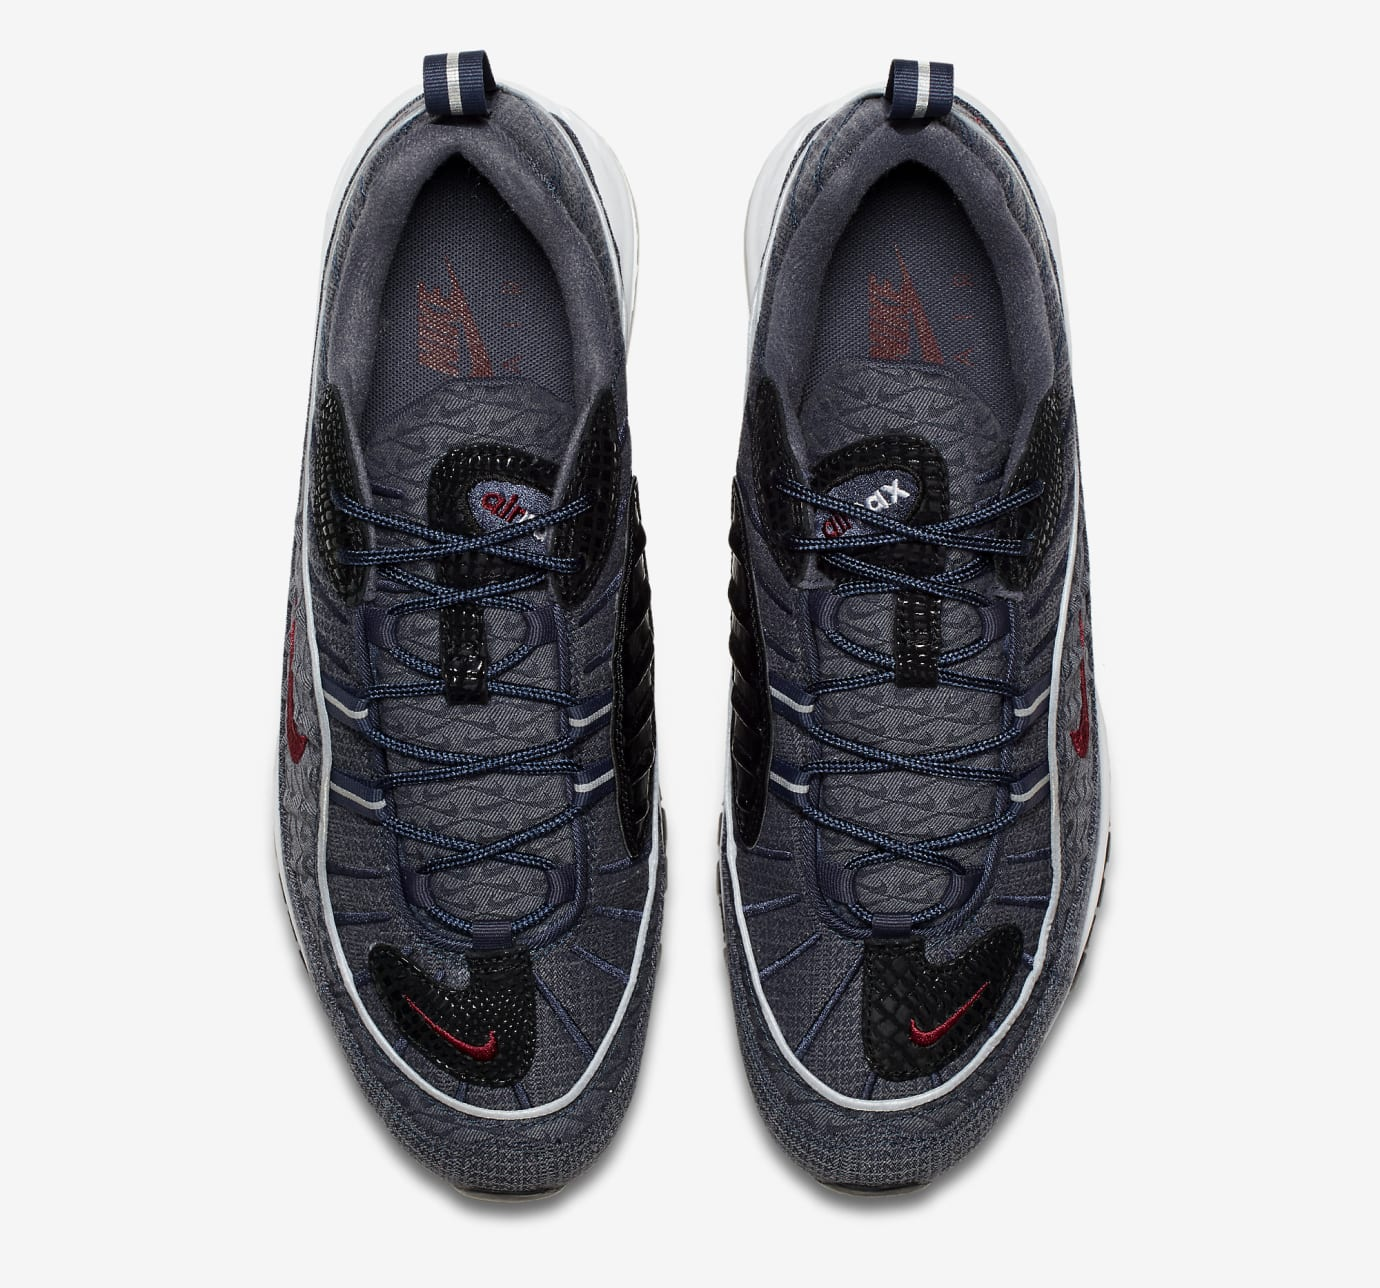 20a95625c148 Image via Nike Nike Air Max 98 Denim 924462-400 Top